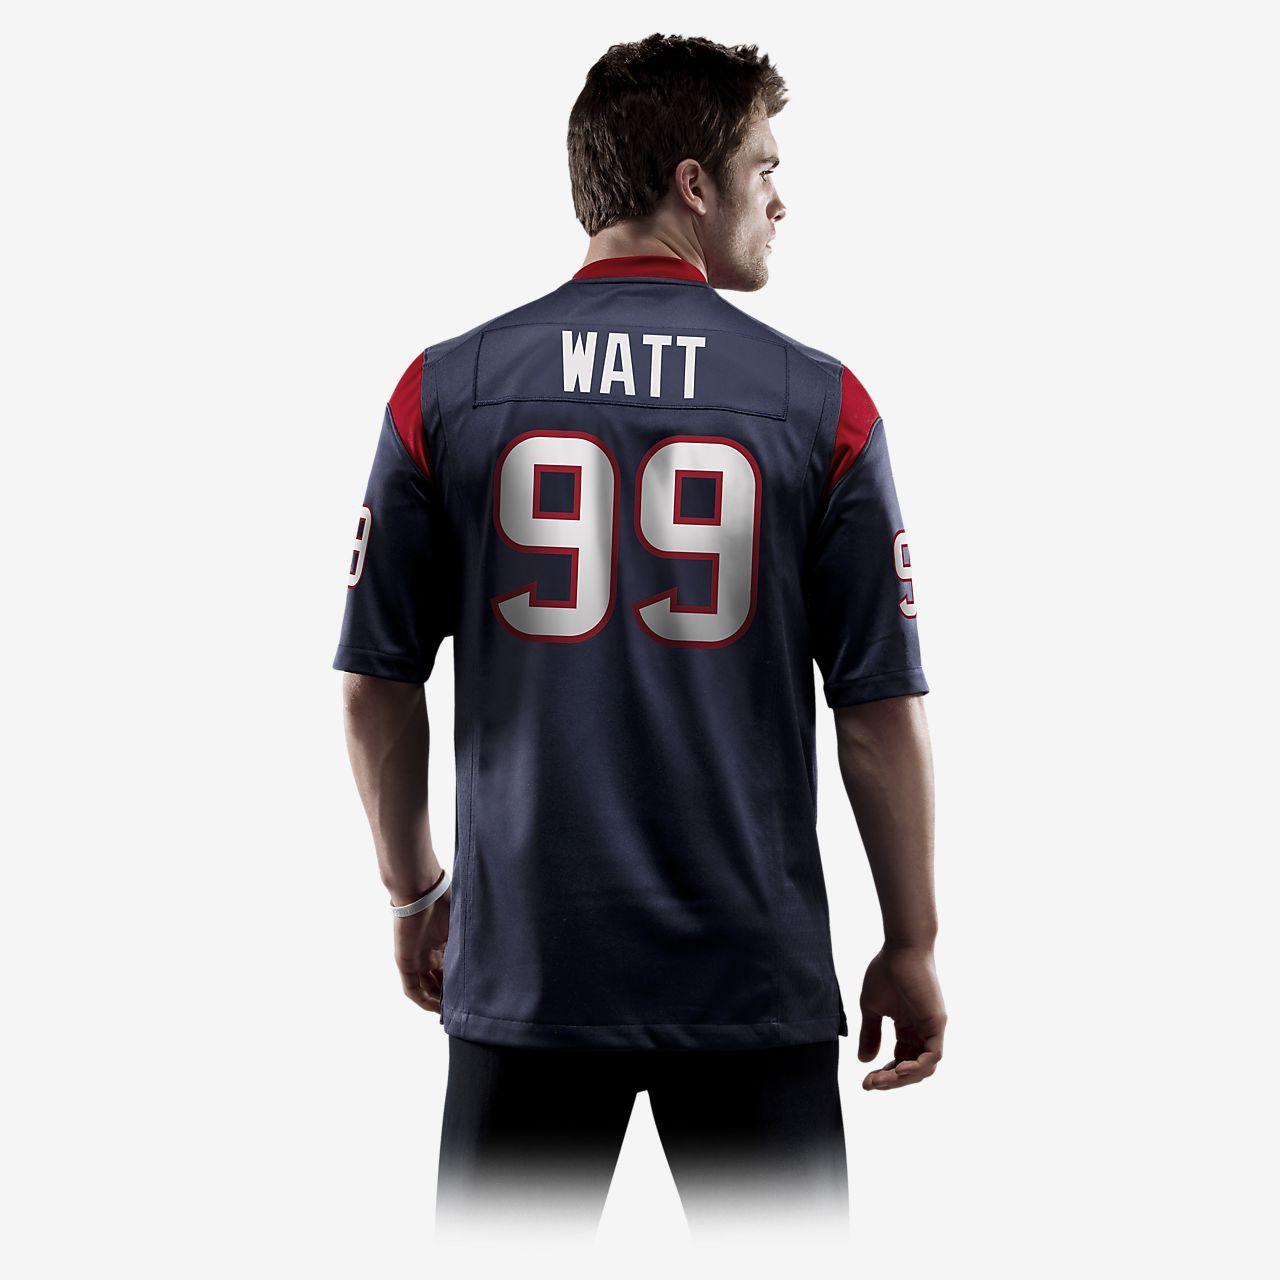 199317cc1e2cf ... NFL Houston Texans (J.J. Watt) Camiseta de fútbol americano de la 1ª  equipación -